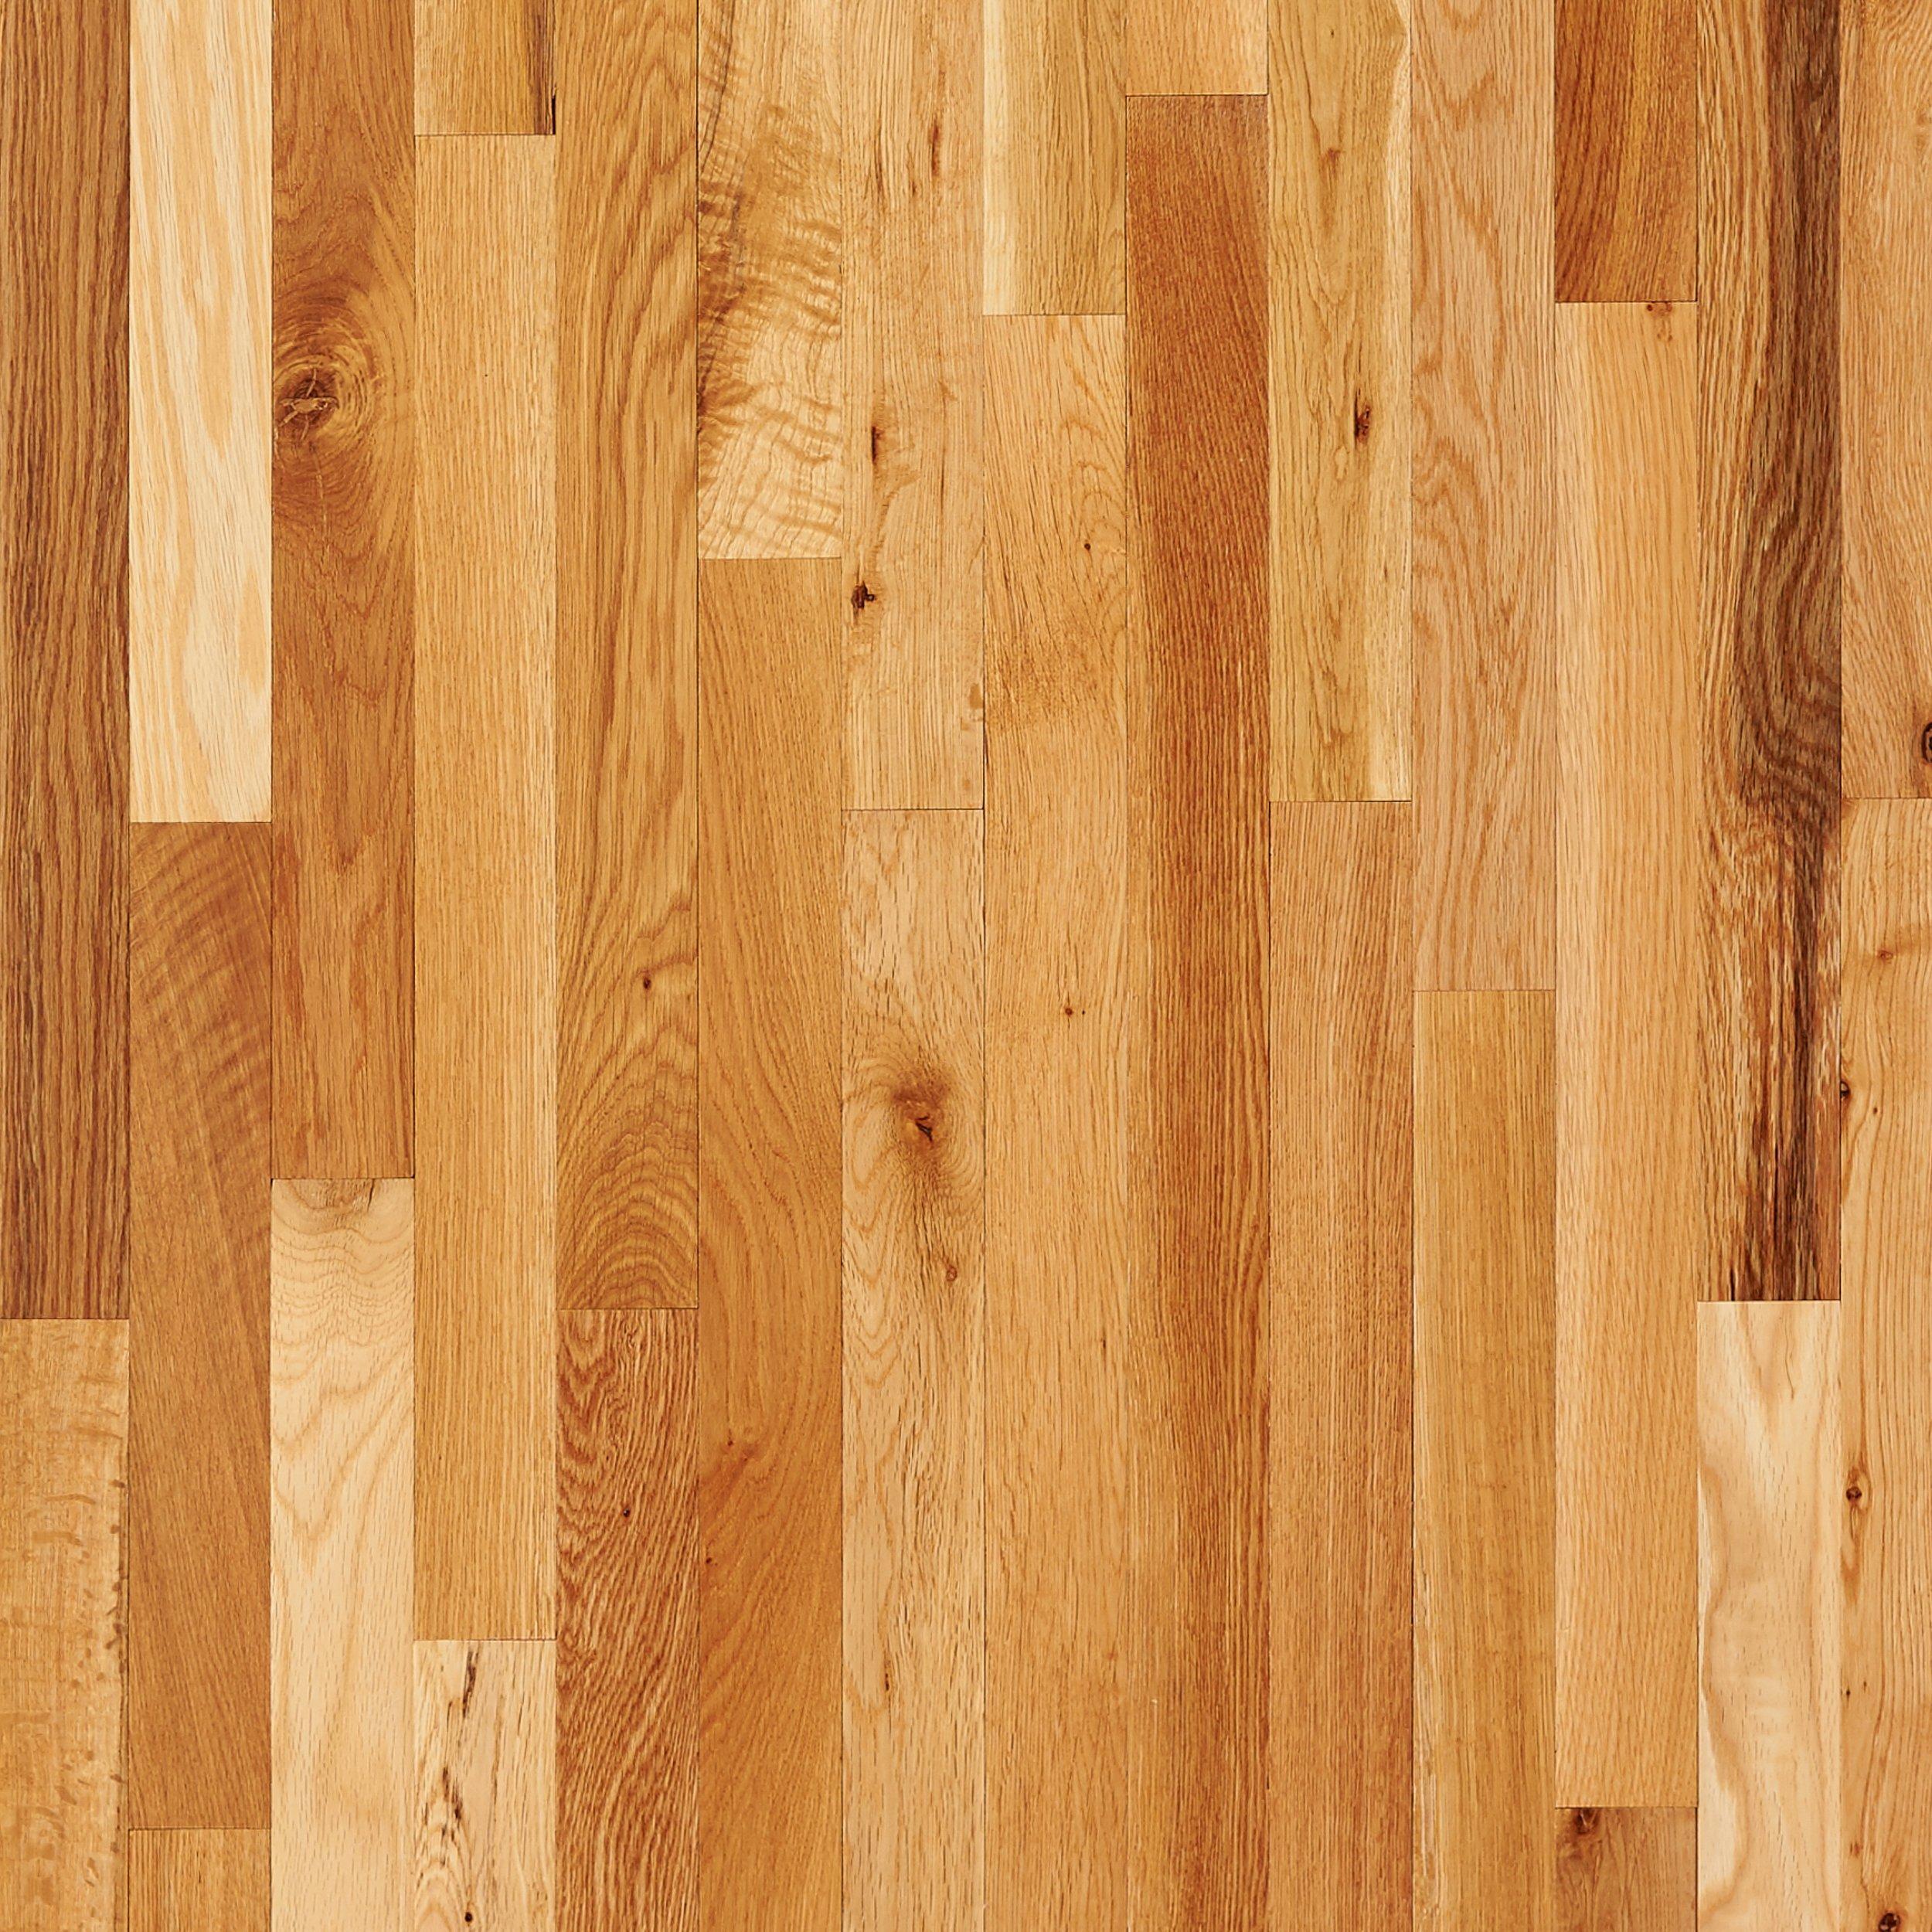 Natural Hardwood Floor Cleaner